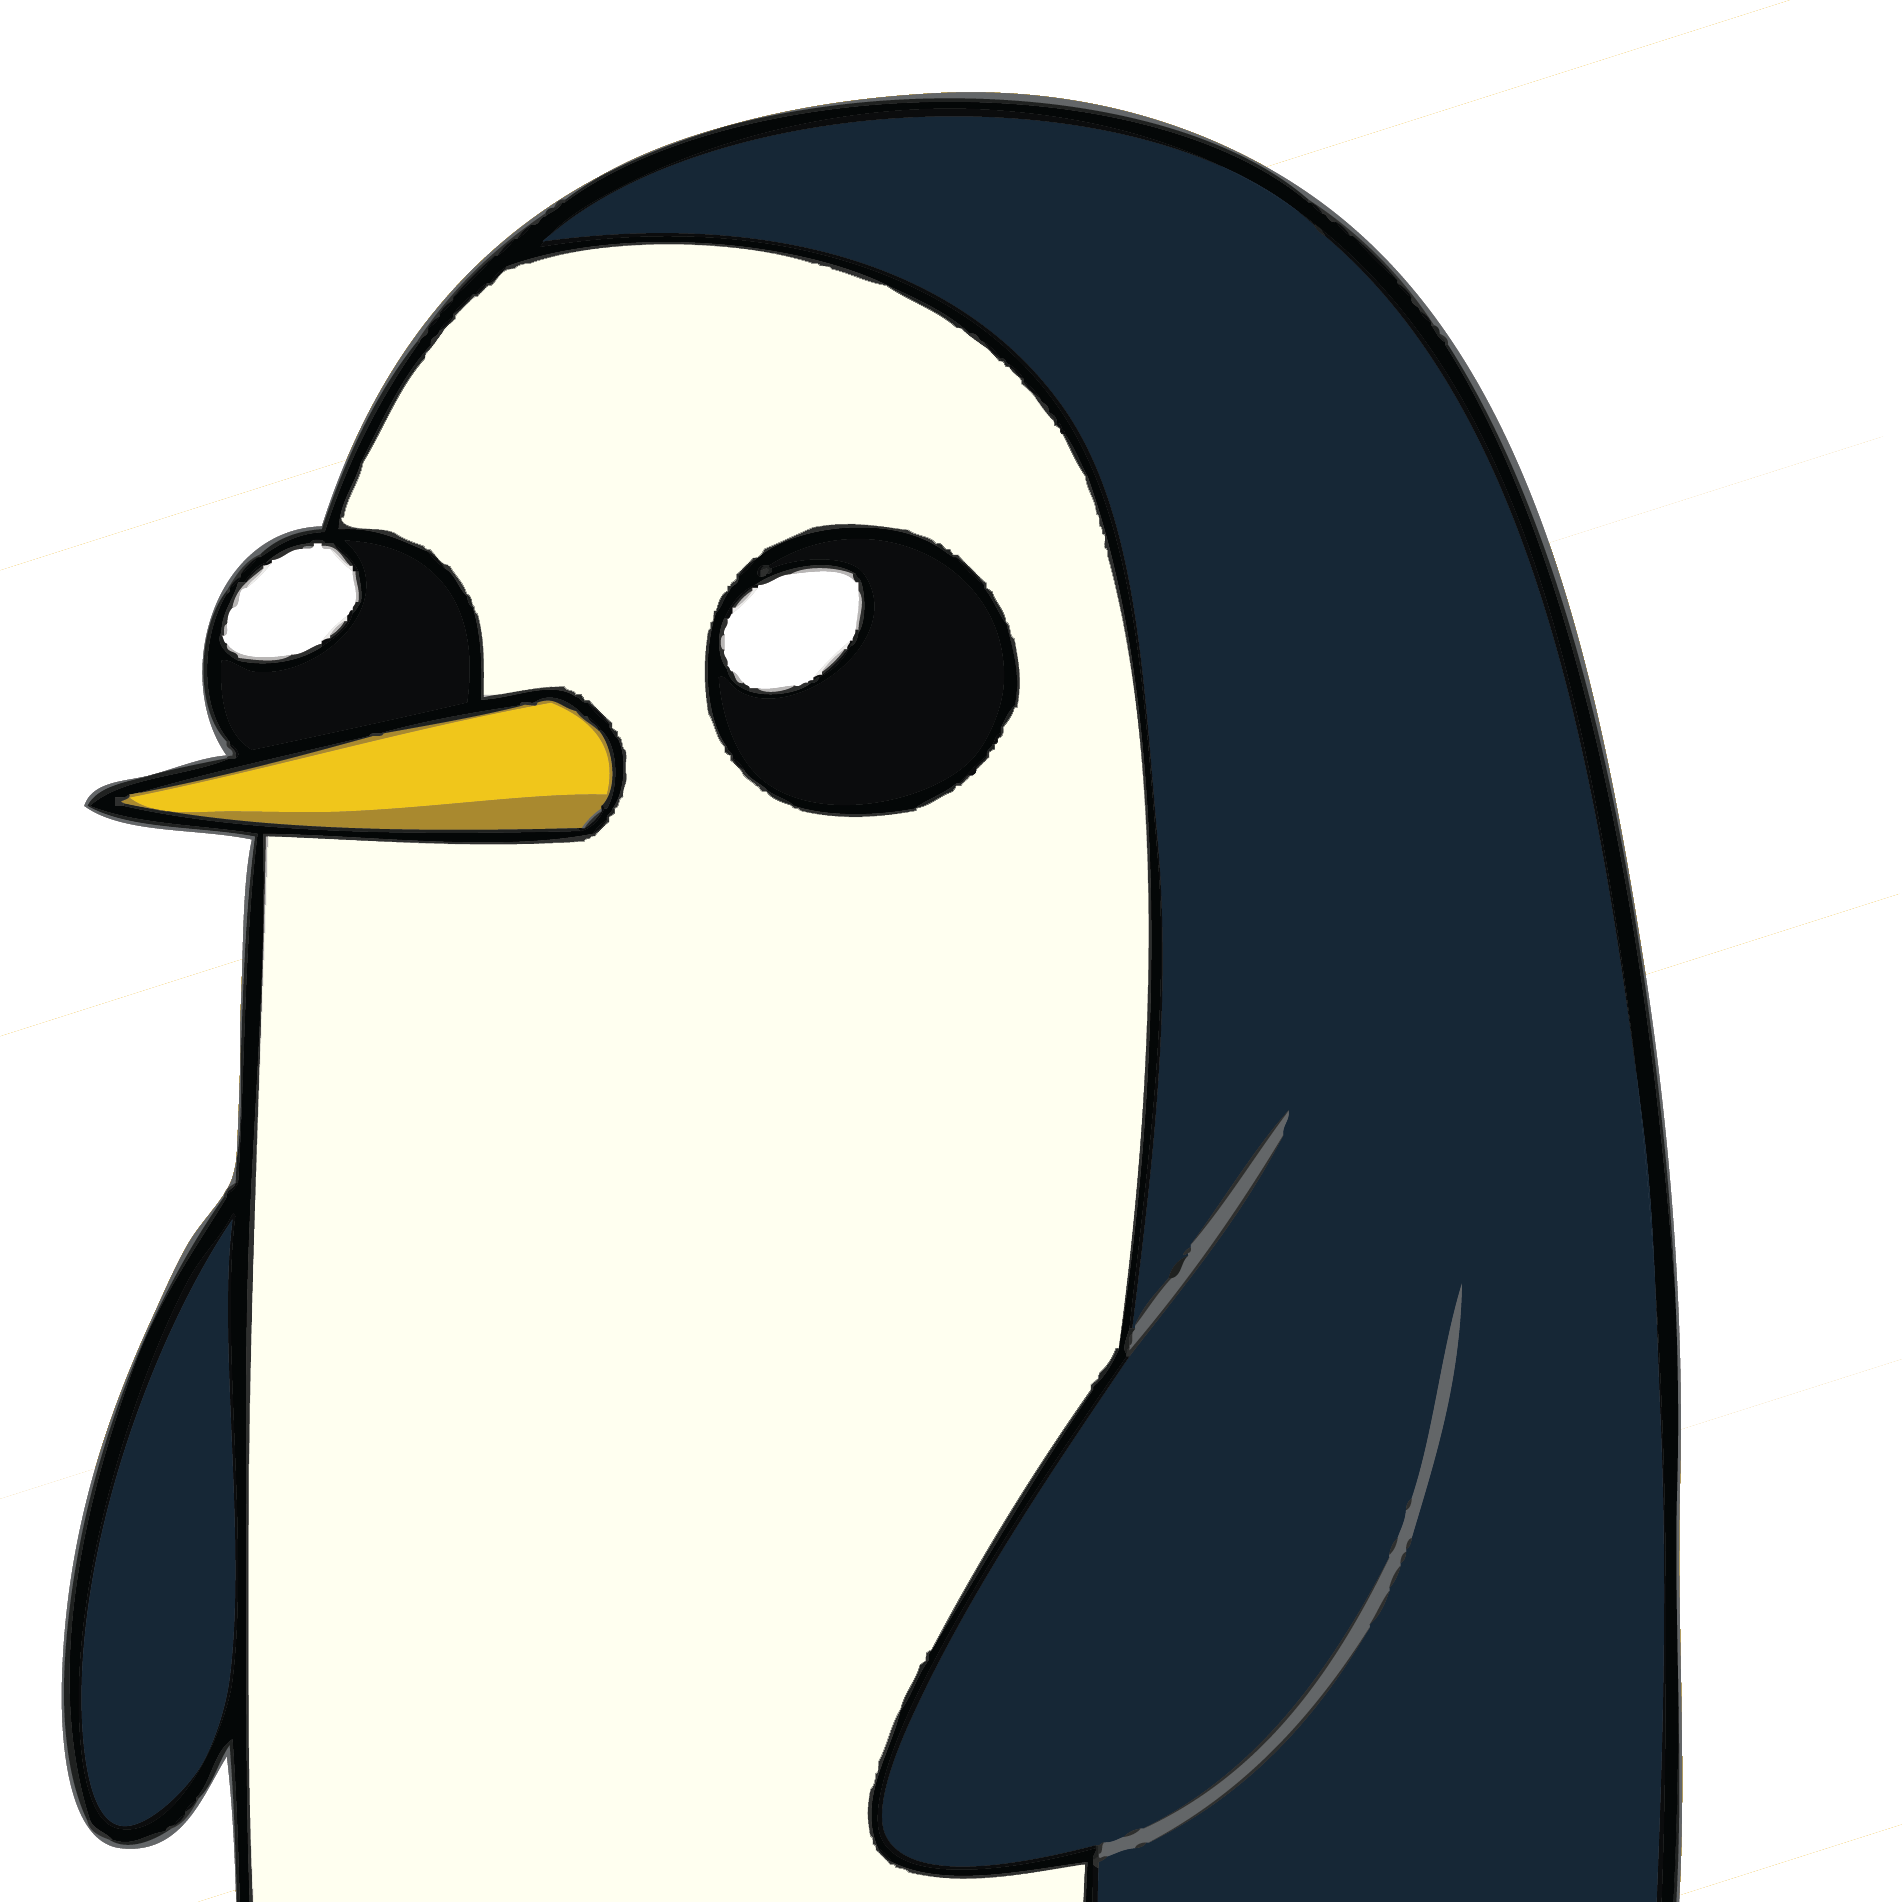 Penguin clipart profile. Racist racistterriost twitter